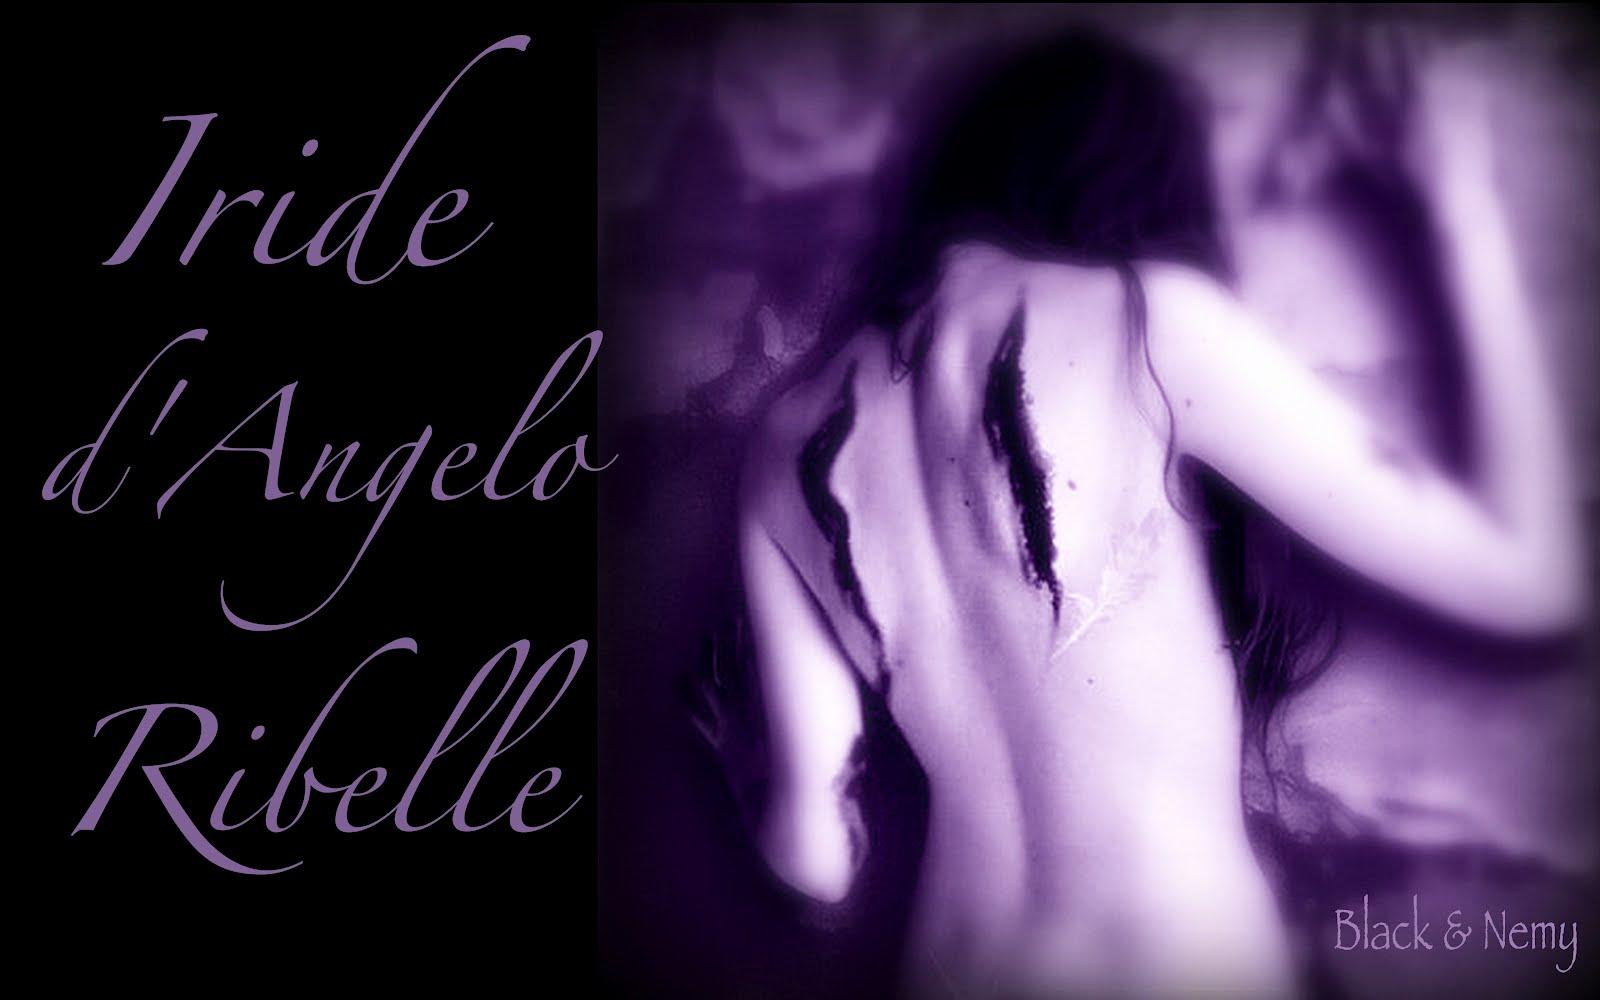 Iride d'Angelo Ribelle